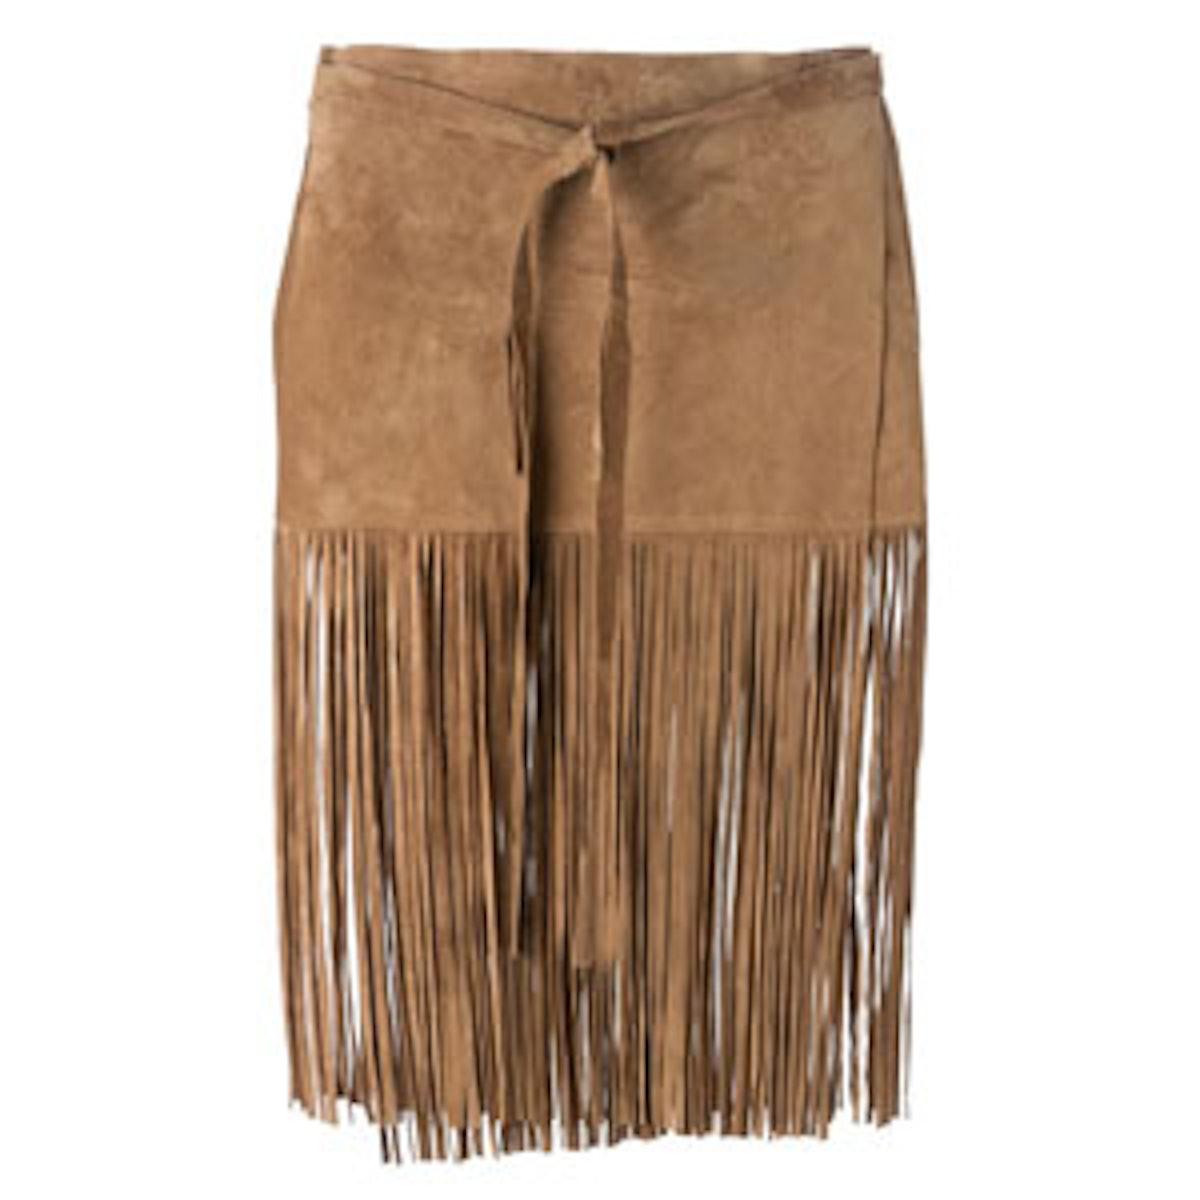 Tied Fringed Skirt